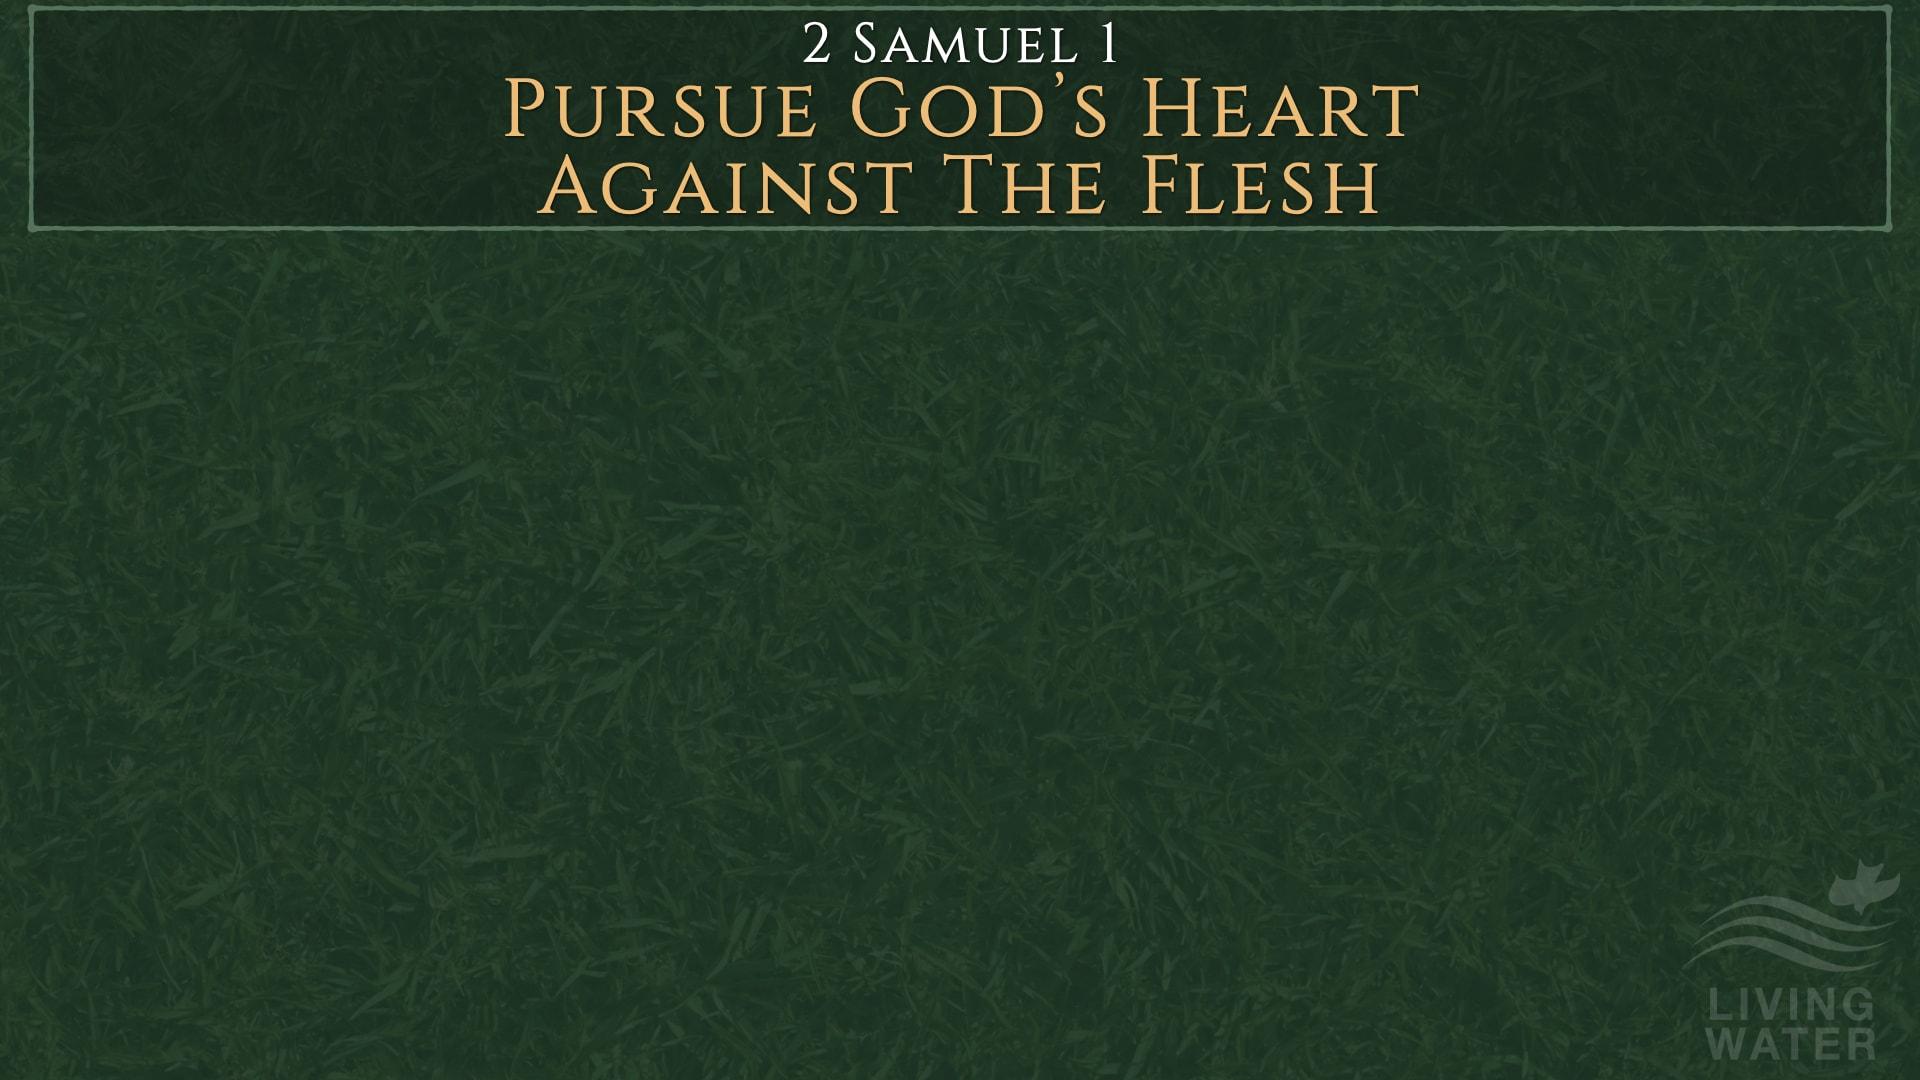 2 Samuel 1, Pursue God's Heart Against The Flesh